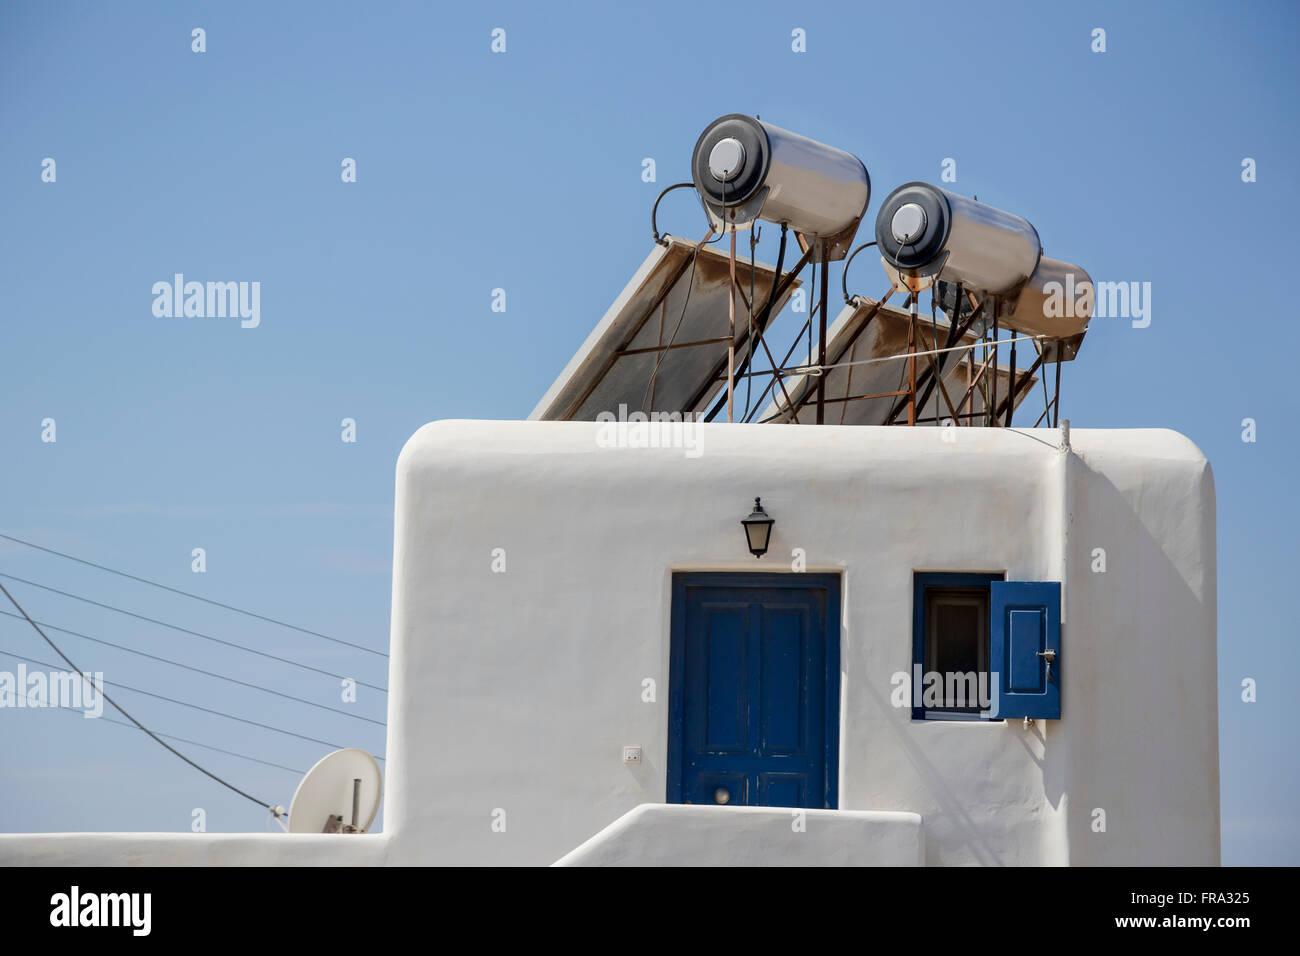 Moderno alimentado con panel solar calentadores de agua caliente para la eficiencia energética están montados Imagen De Stock